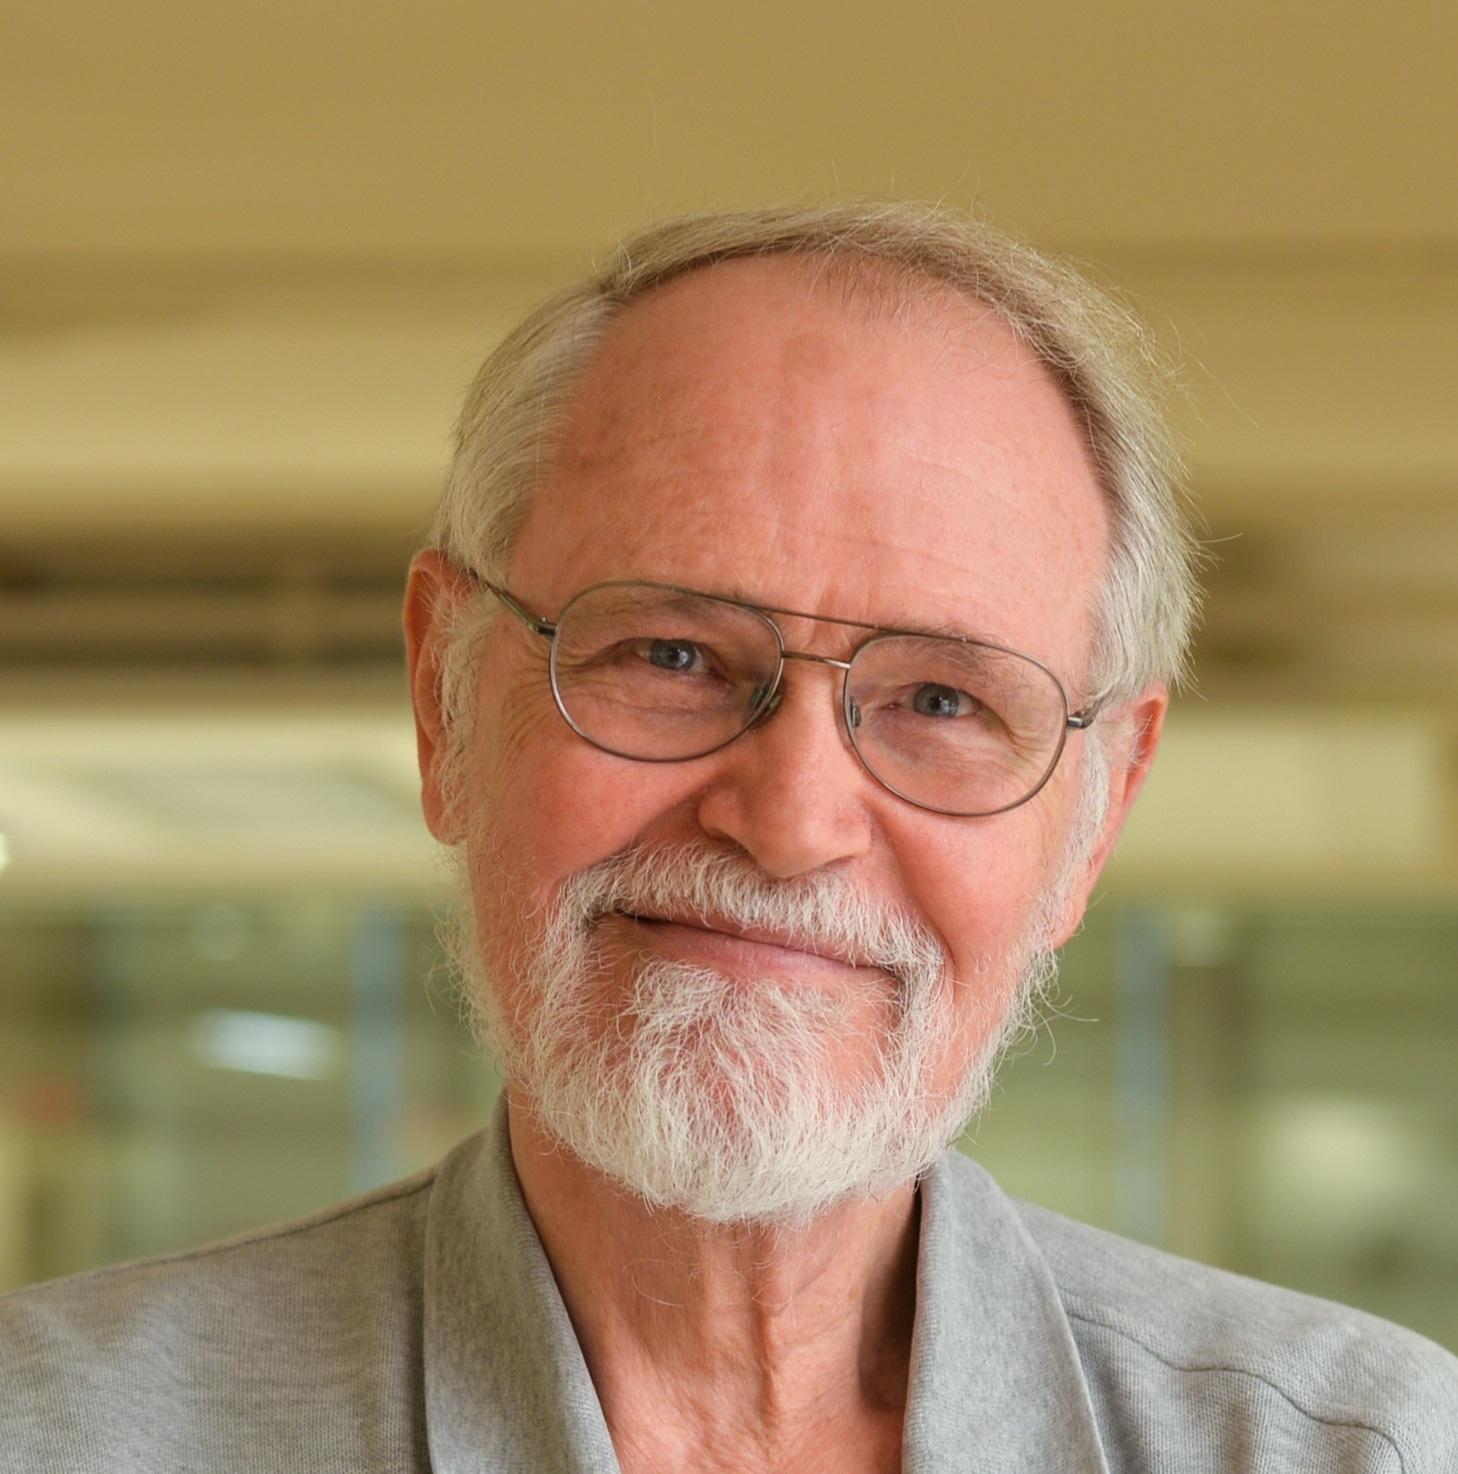 Photo of Brian Kernighan